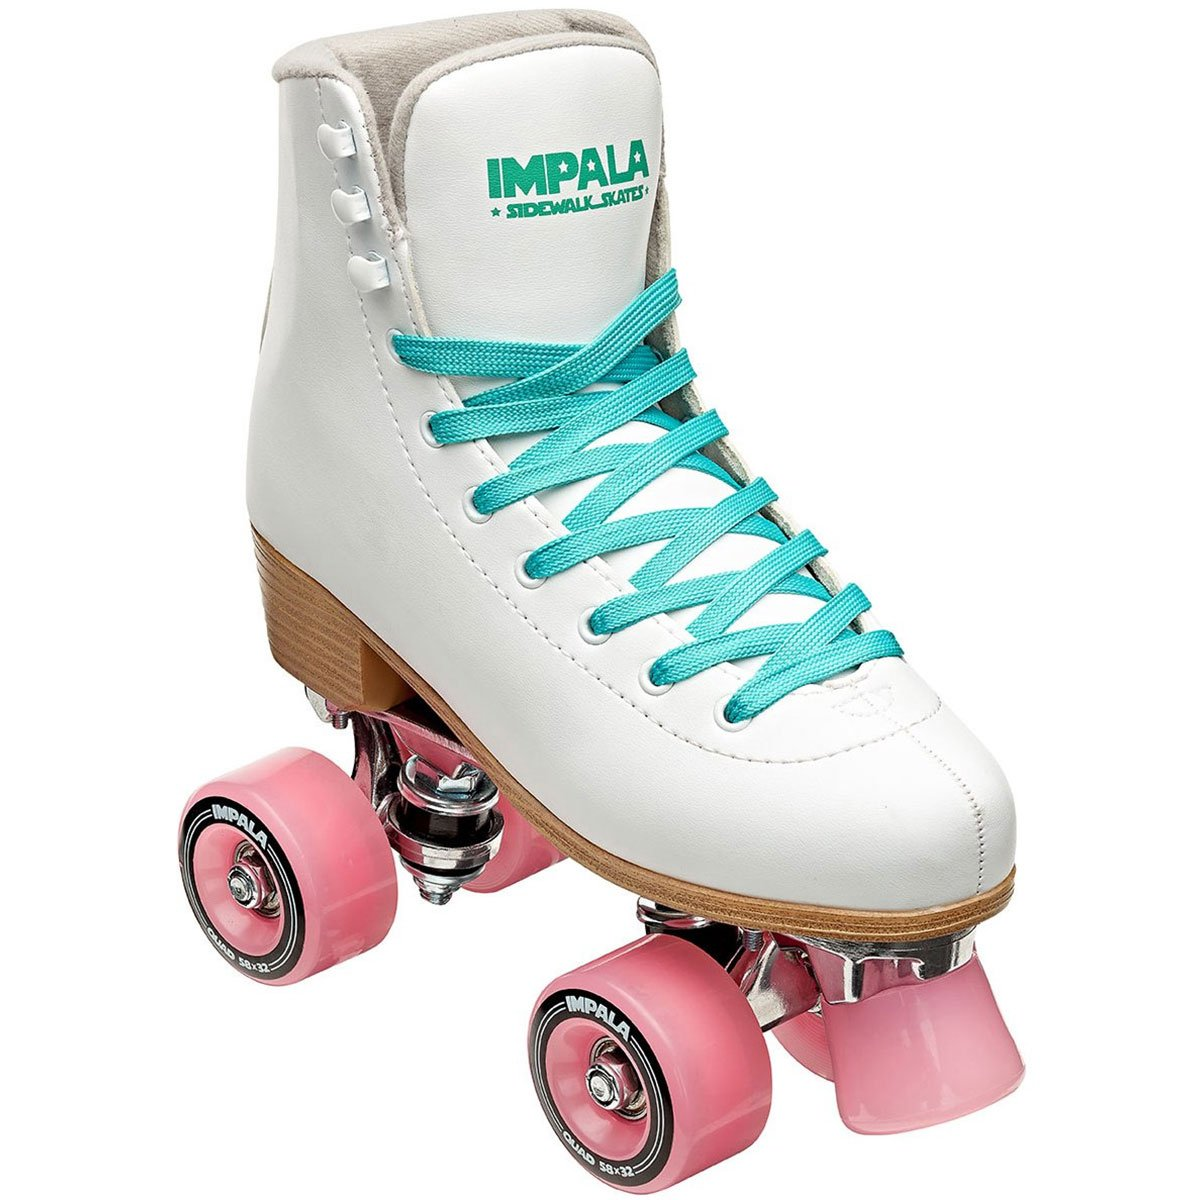 Impala RollerSkates Women's Lace-Up Rollerskates, White/Pink, 4